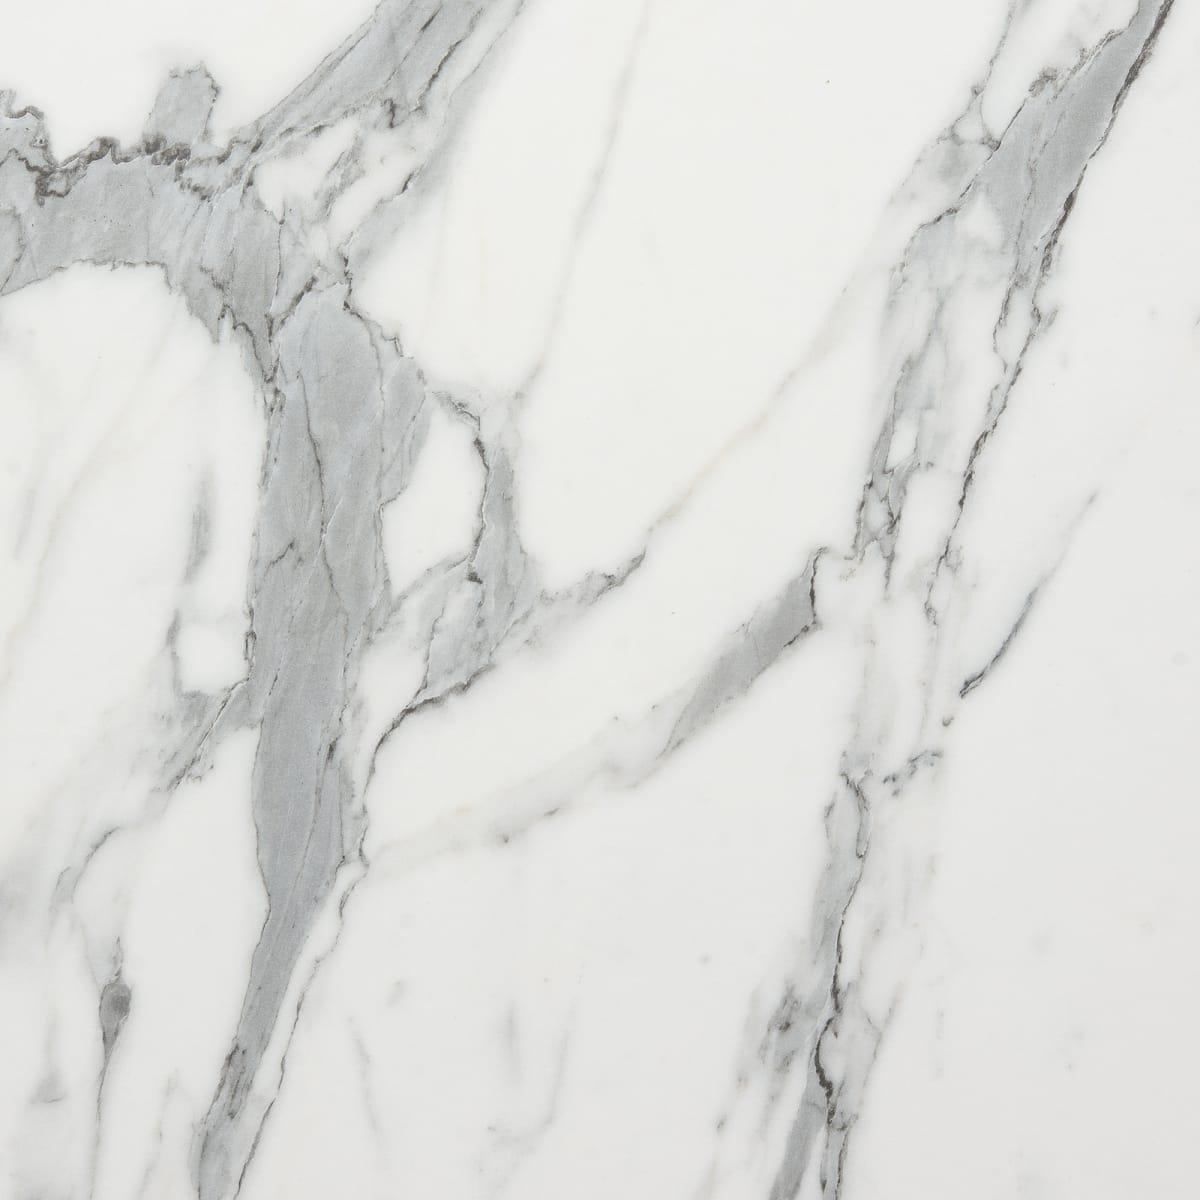 Стеновая панель «Маренго», 300х0.4х60 см, МДФ